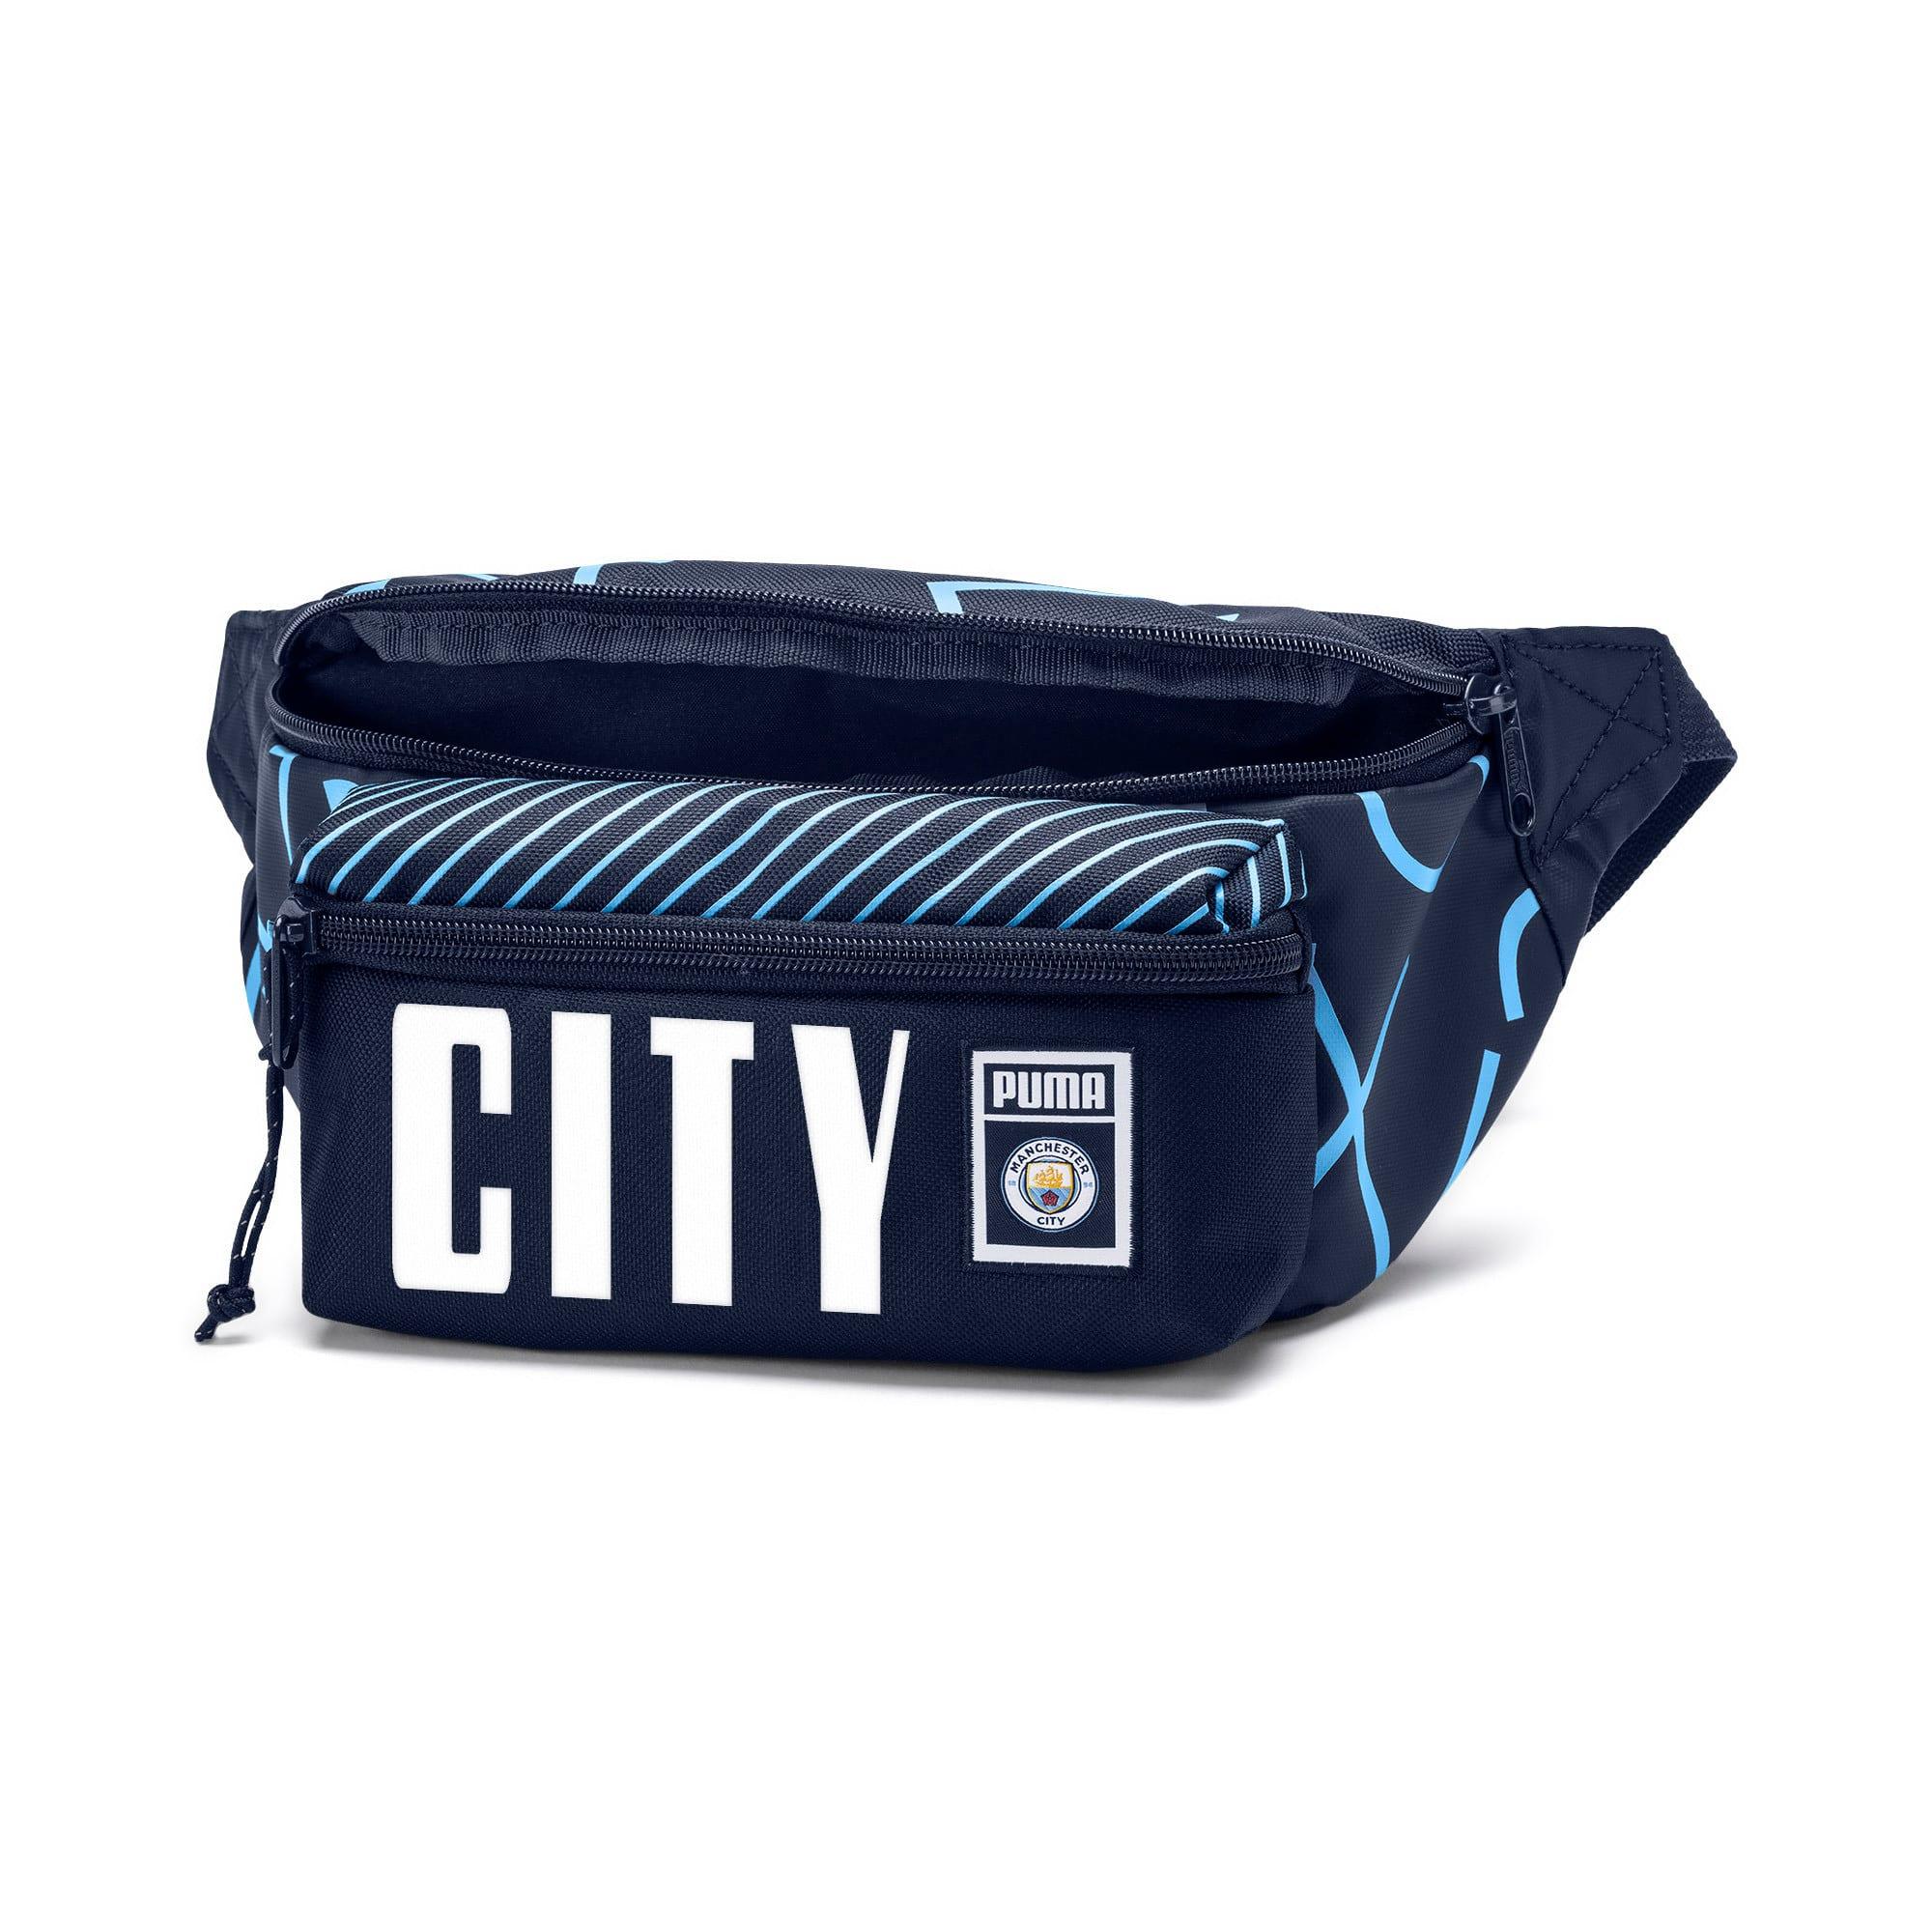 Thumbnail 3 of Man City Waist Bag, Peacoat-Team Light Blue, medium